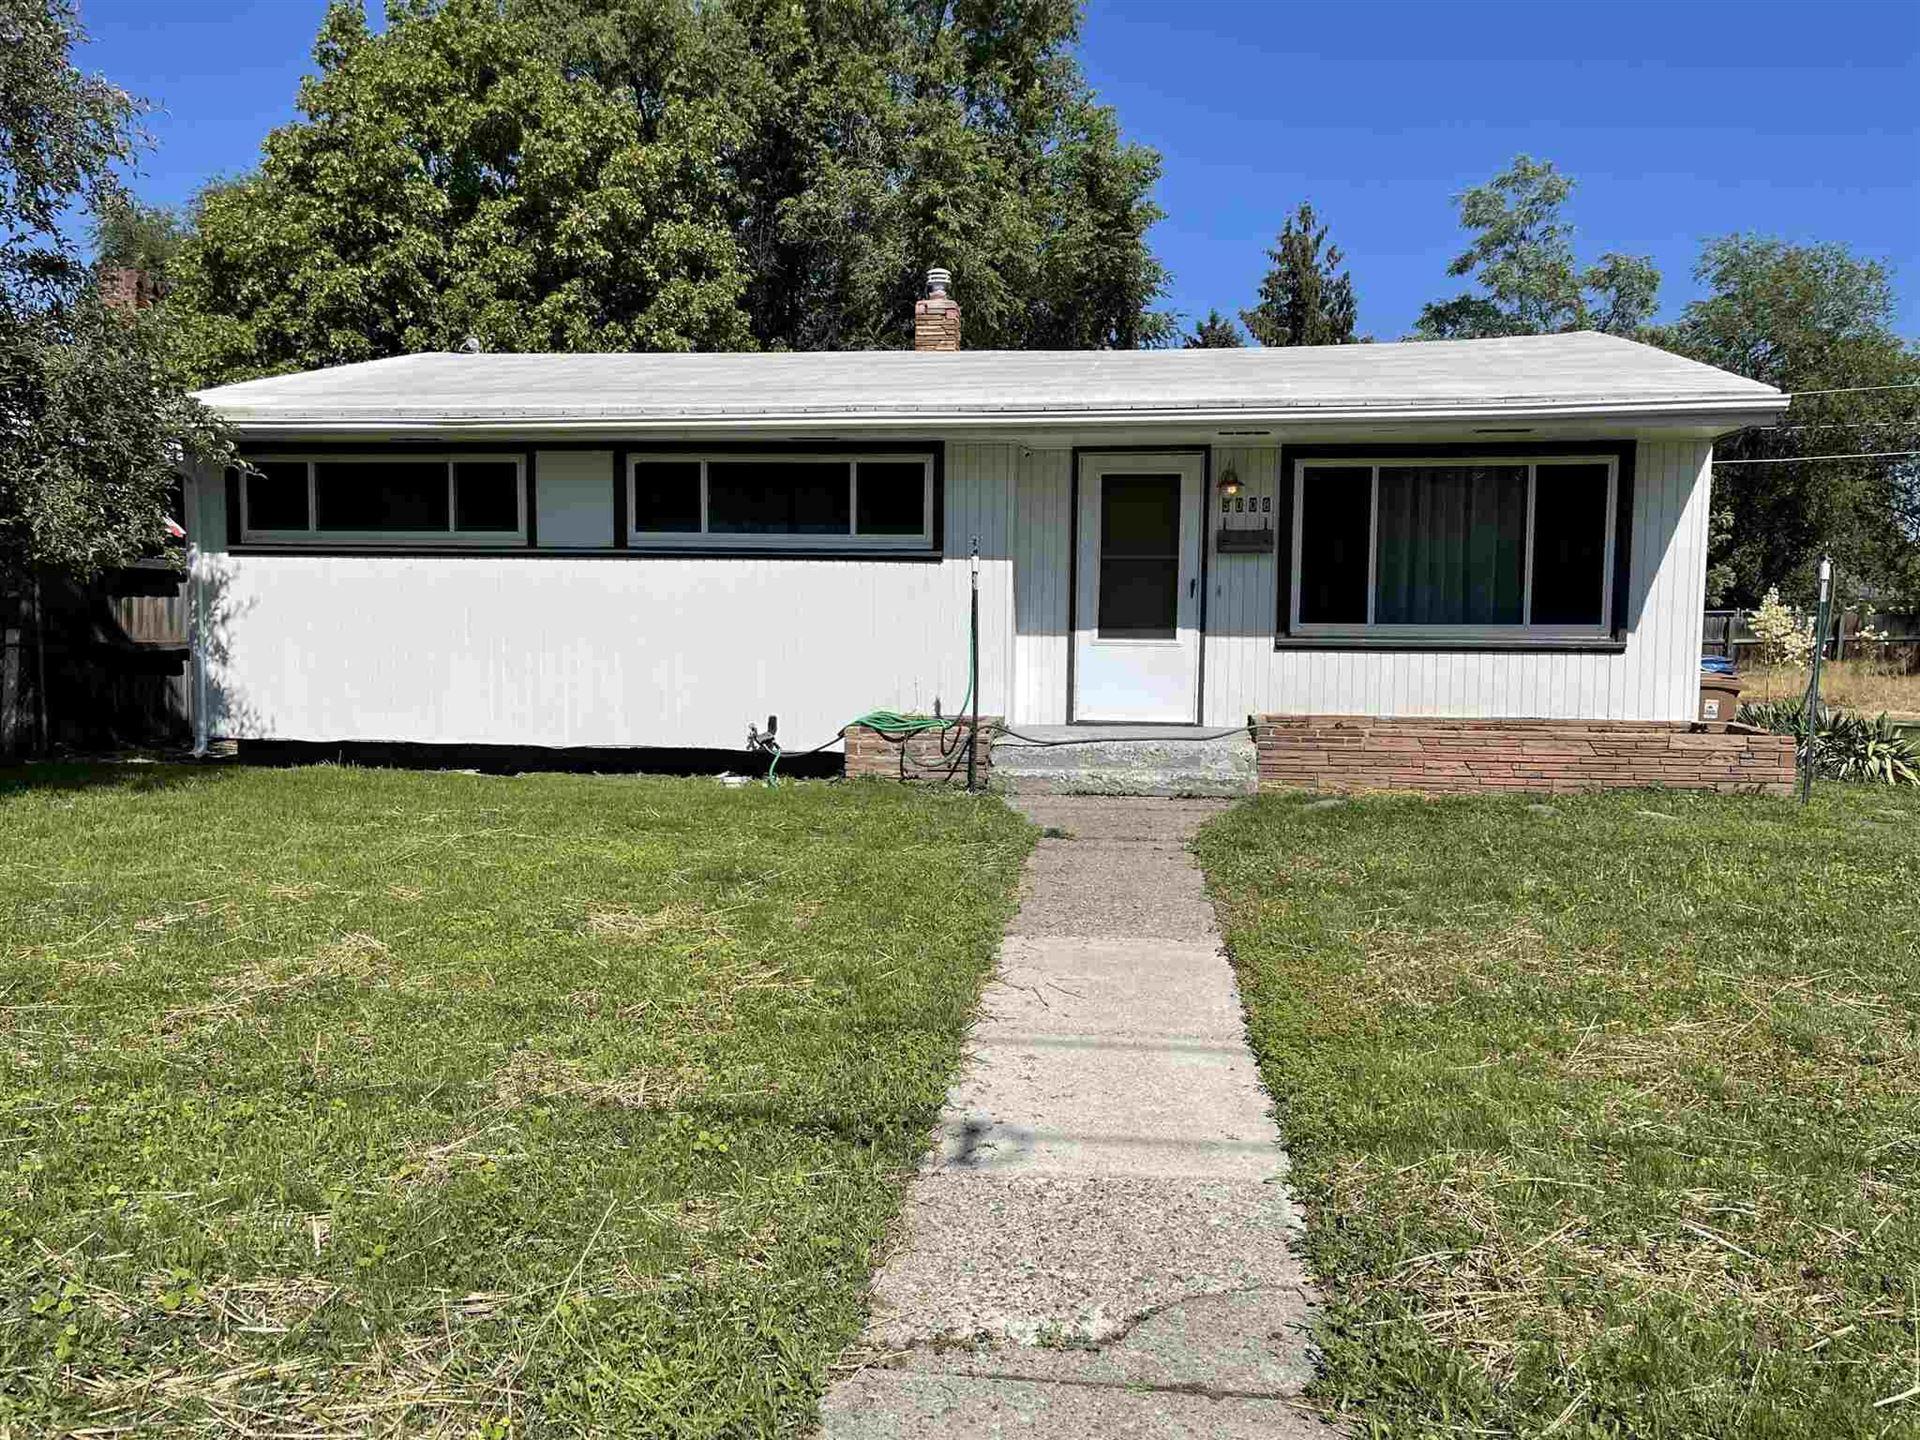 5008 N Crestline St, Spokane, WA 99207 - #: 202118357